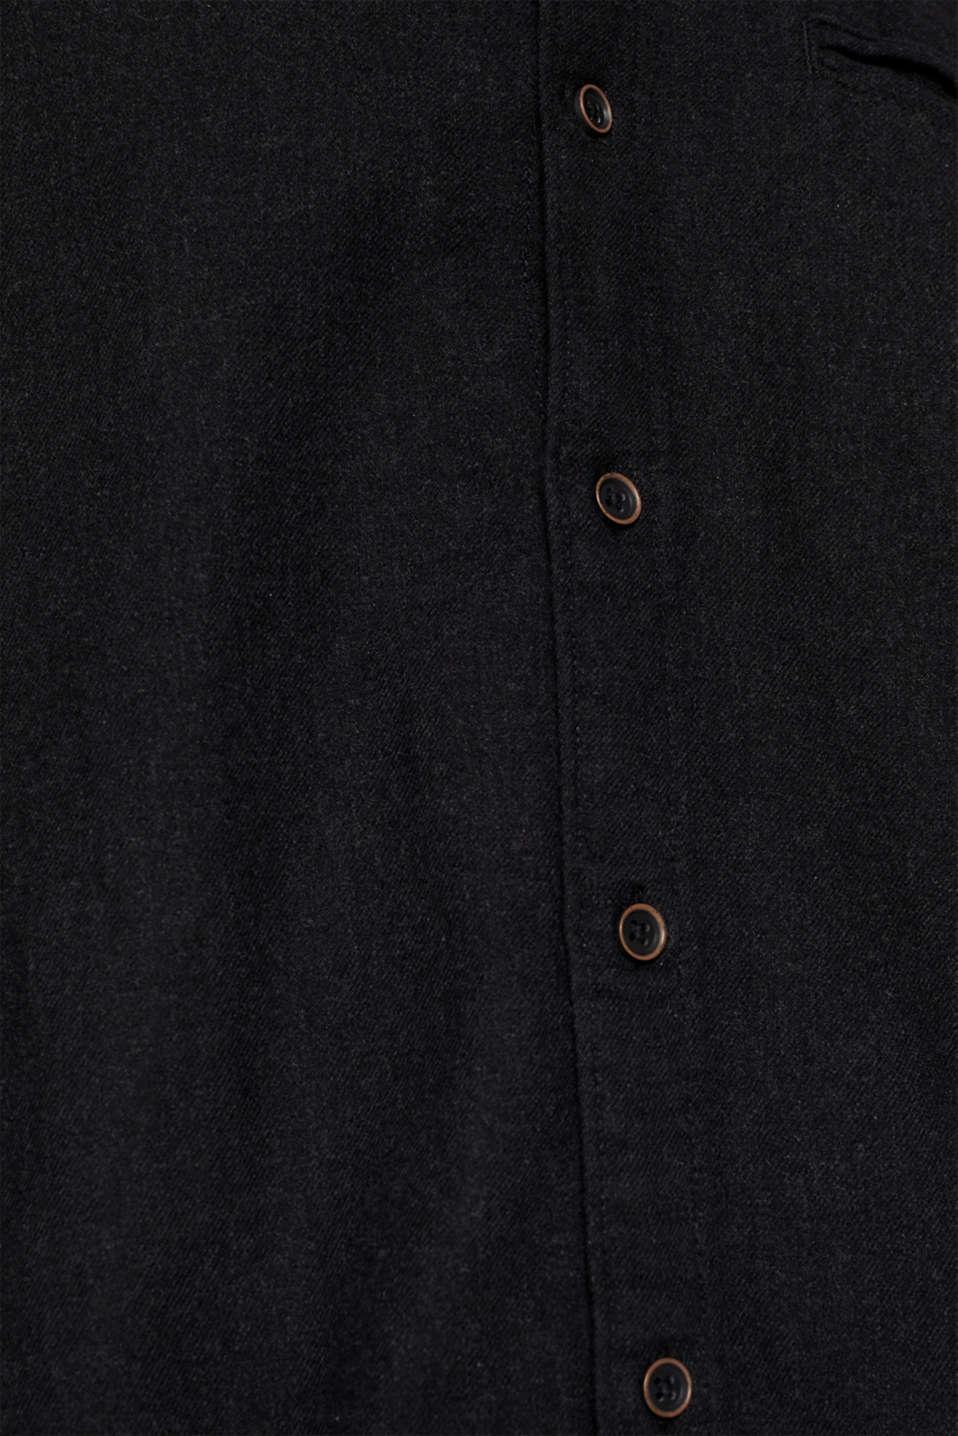 Shirts woven Slim fit, DARK GREY 5, detail image number 4